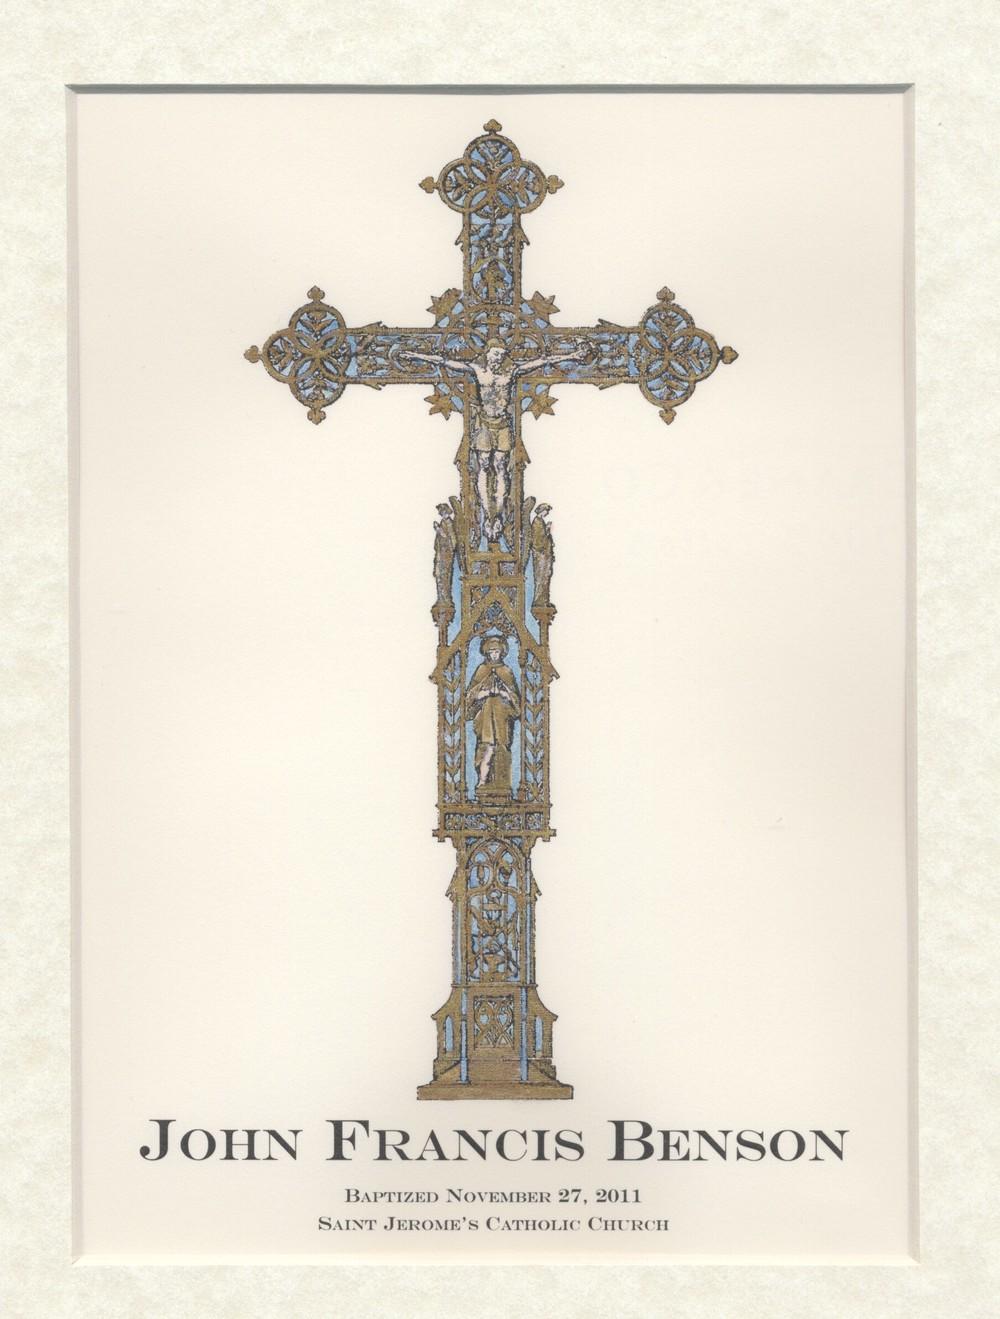 CrusifixCross.Benson.jpg